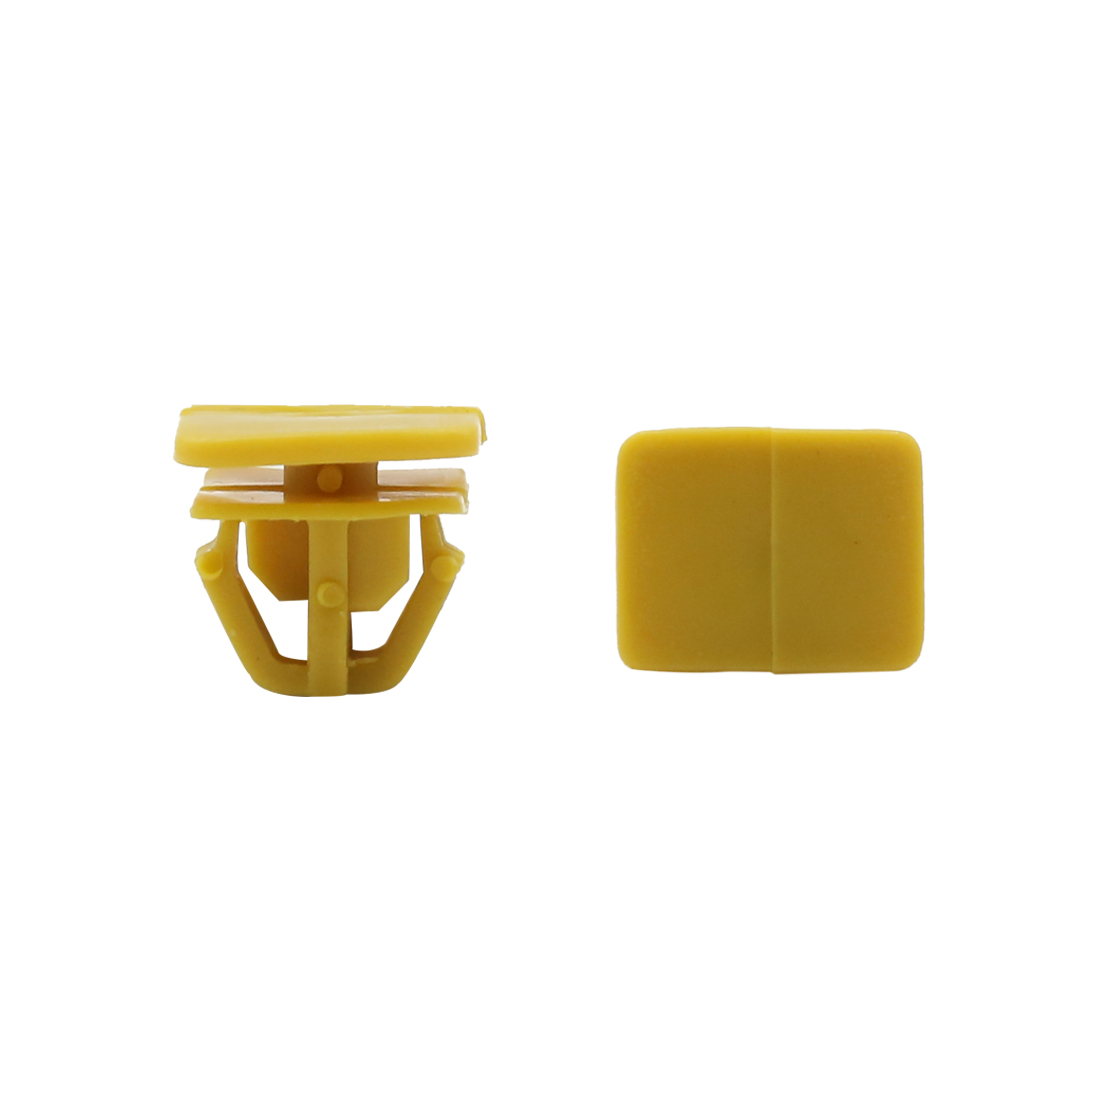 50pcs Yellow Rectangle Car Rivet Fastener Door Trim Panel Retainer Bumper Clips